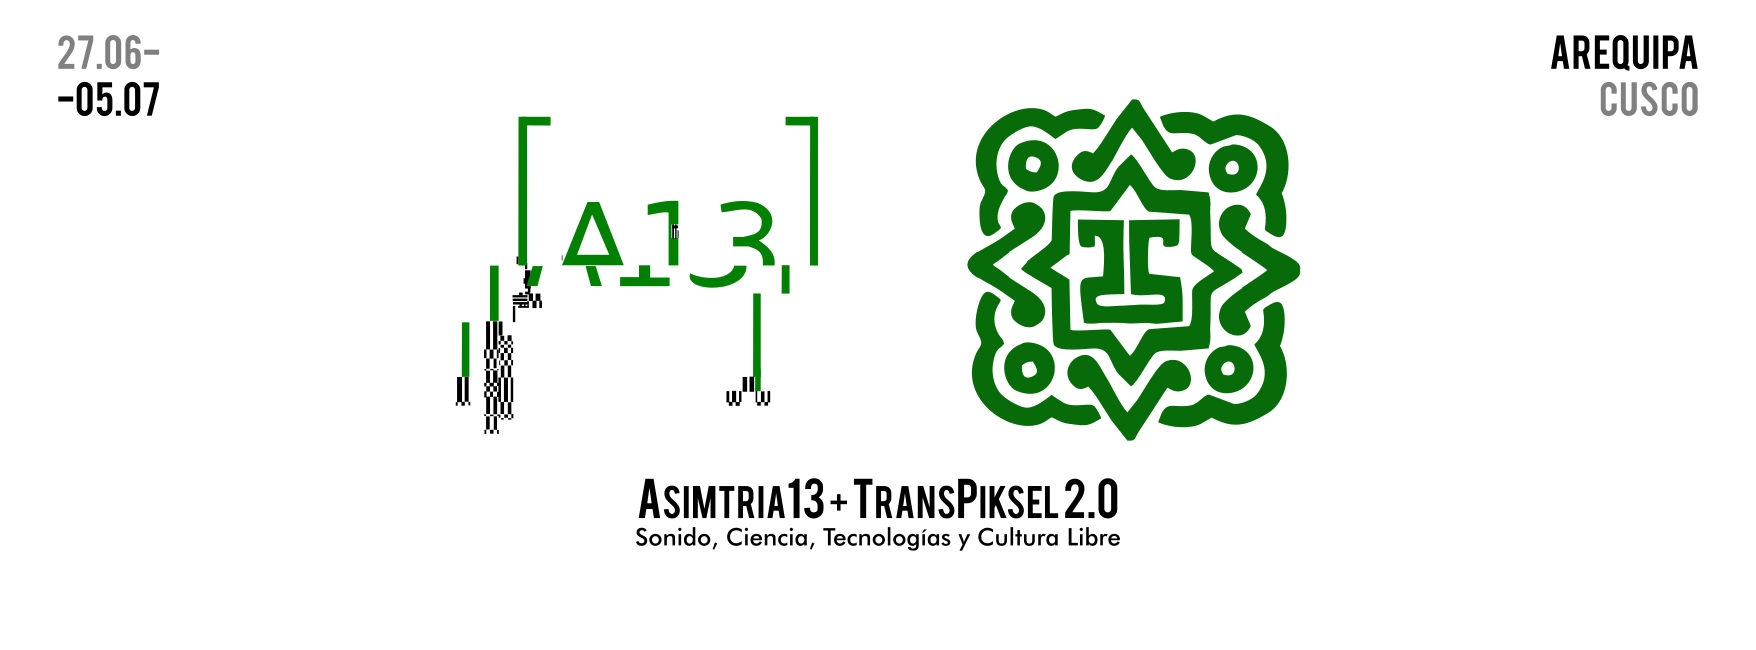 [A13] | Asimtria13 + TransPiksel 2.0